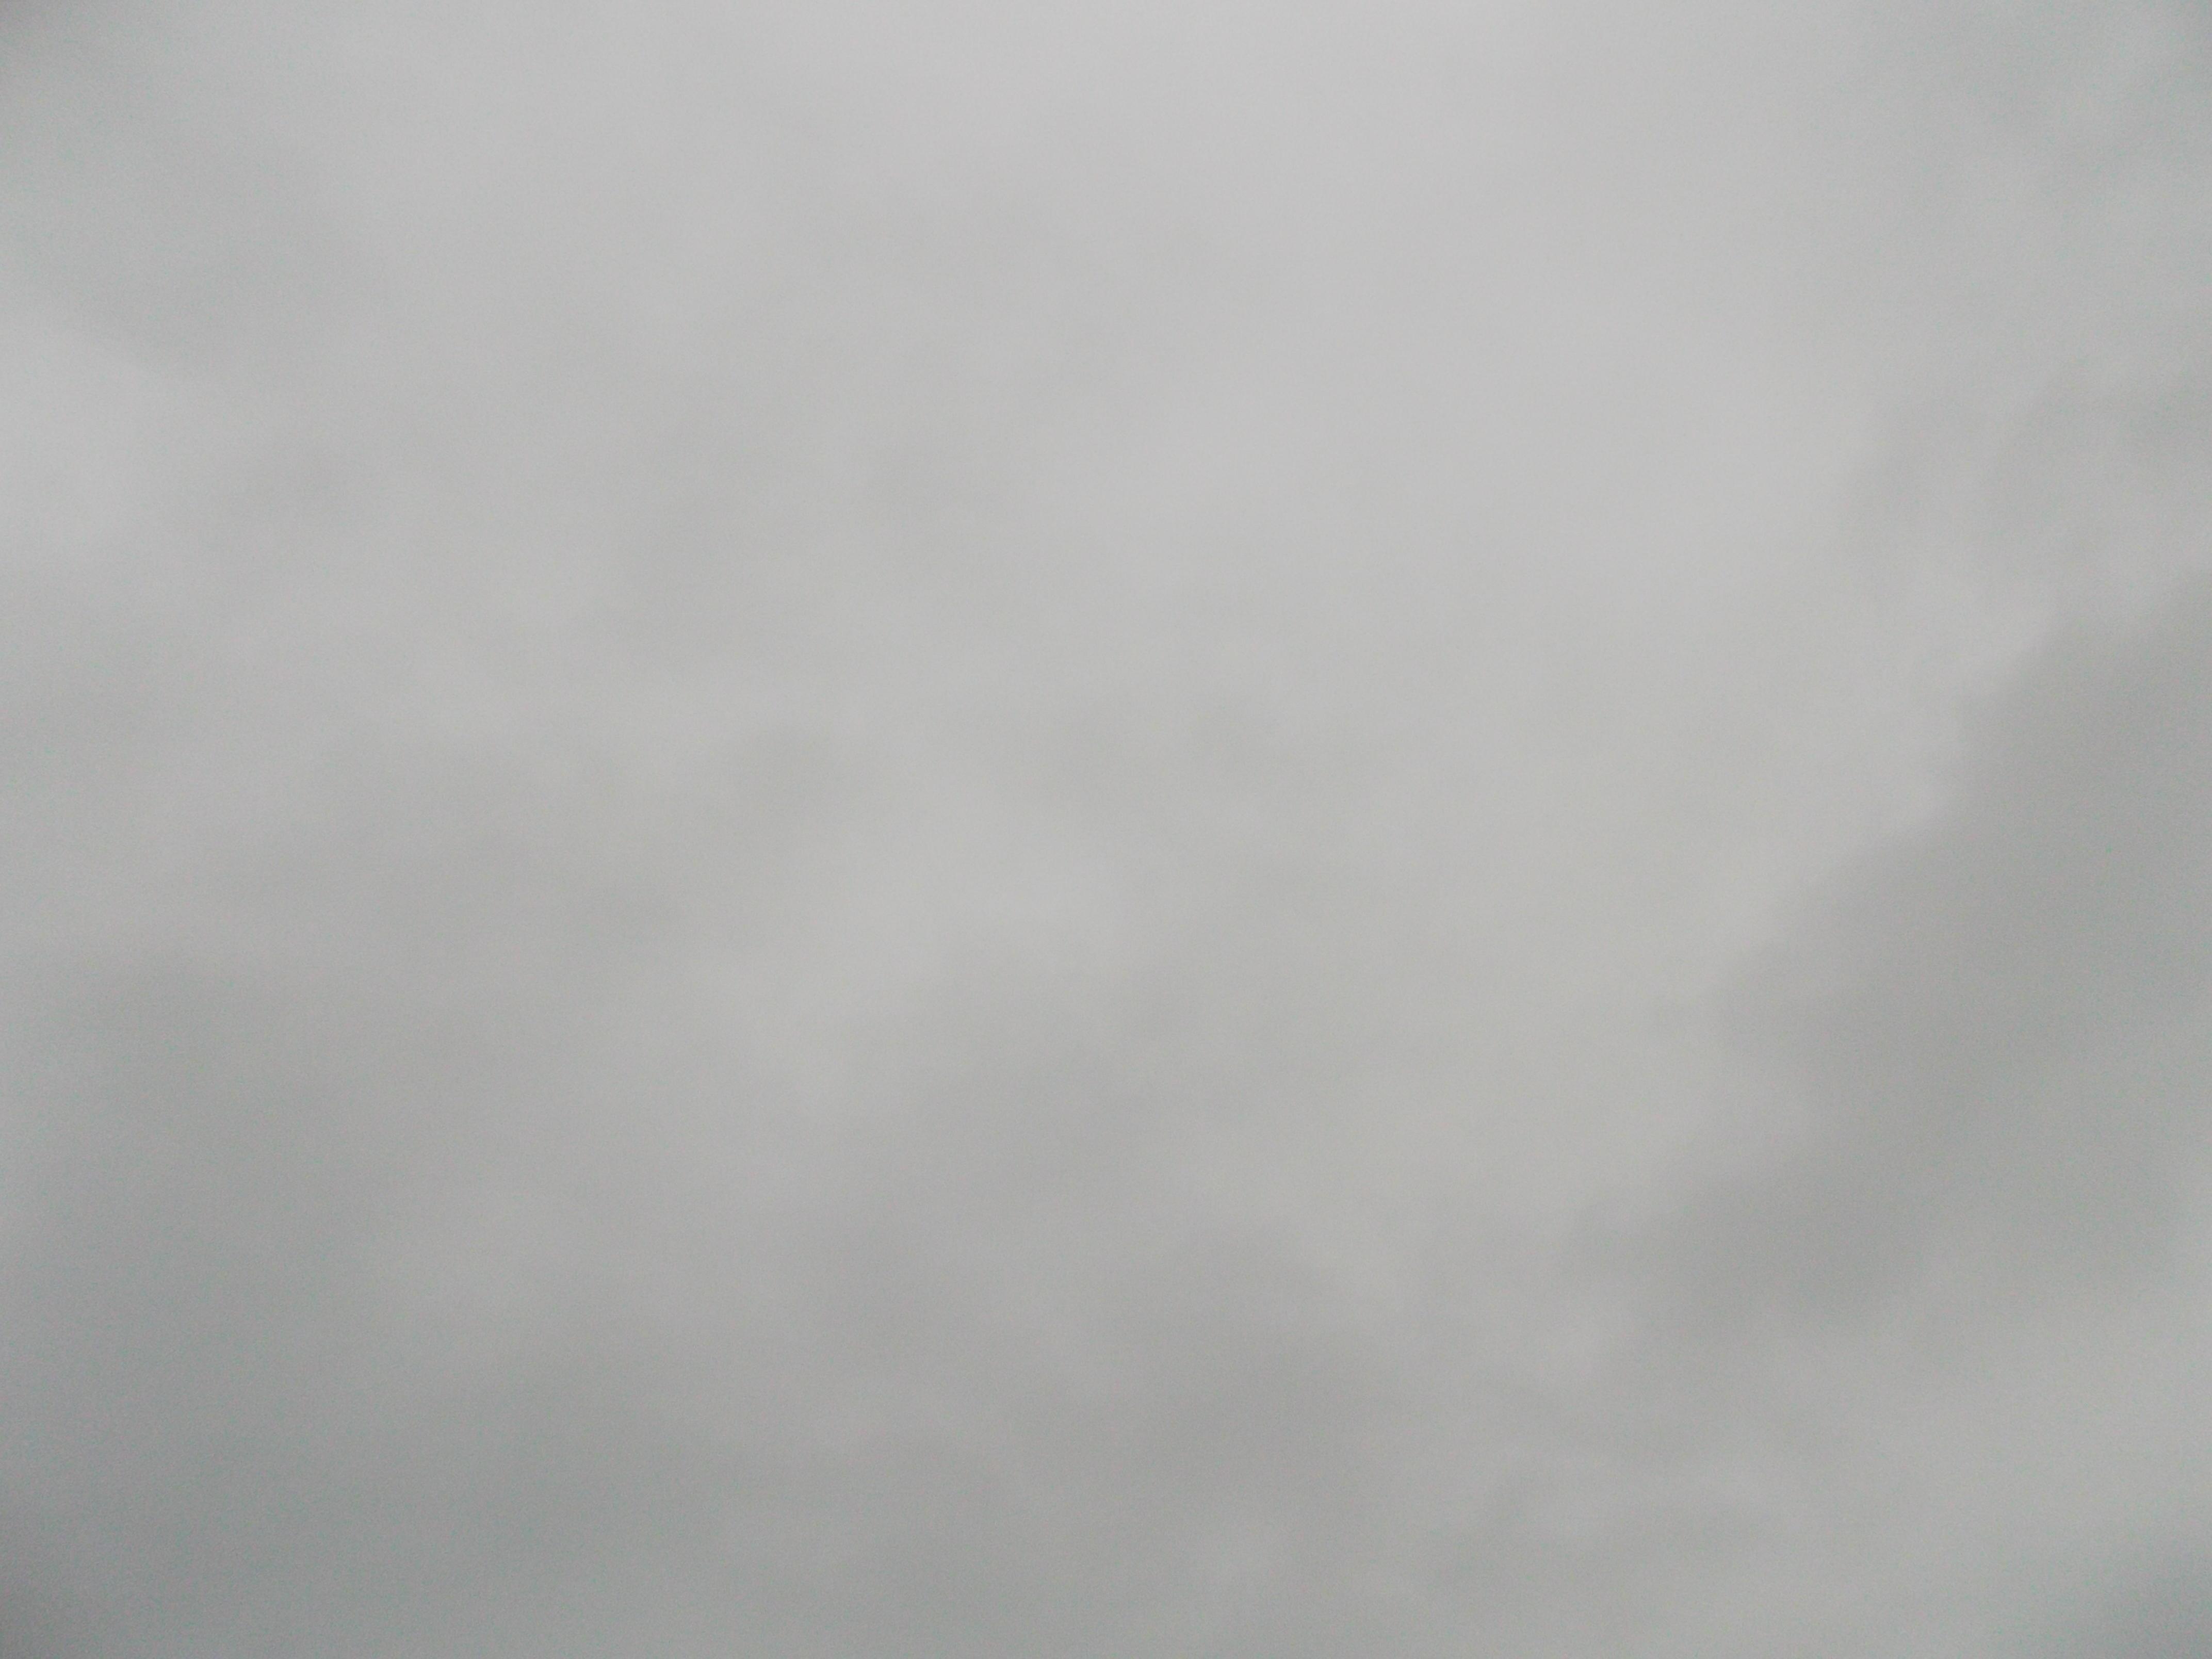 2013-01-20 Longitude -0.371 Latitude 49.182 Altitude 13 Heure 13h27